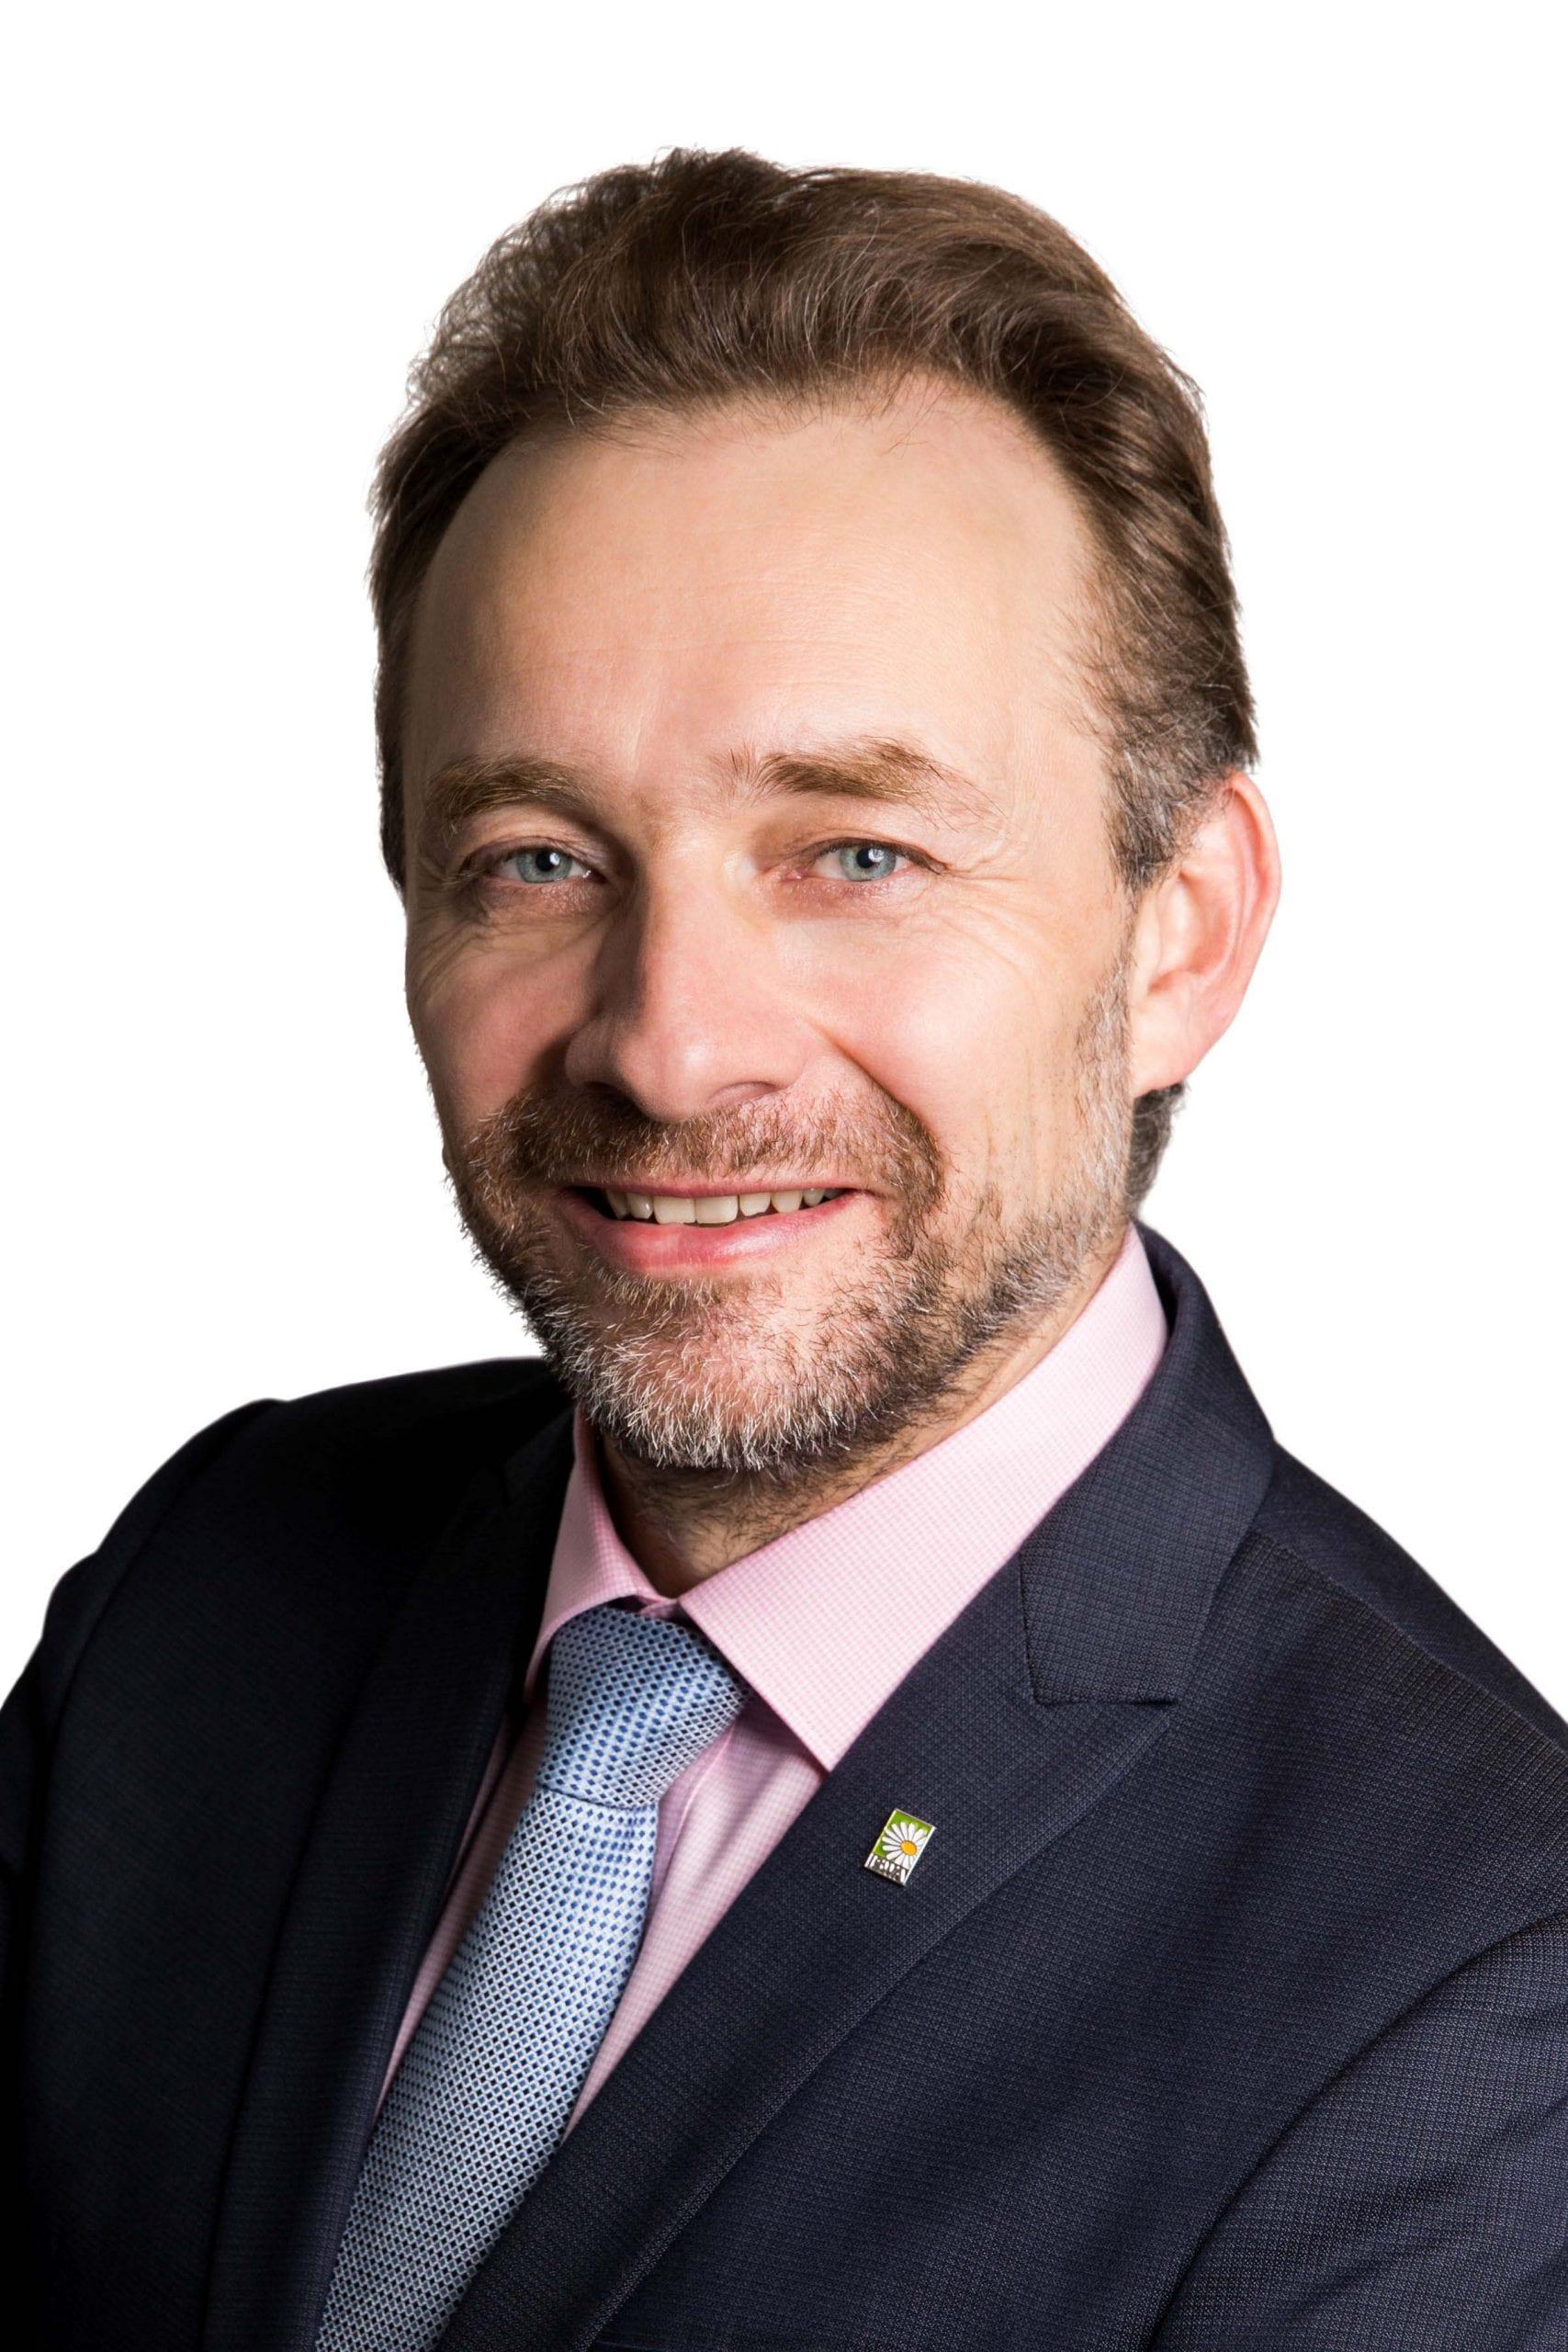 Arne M. Ragossnig